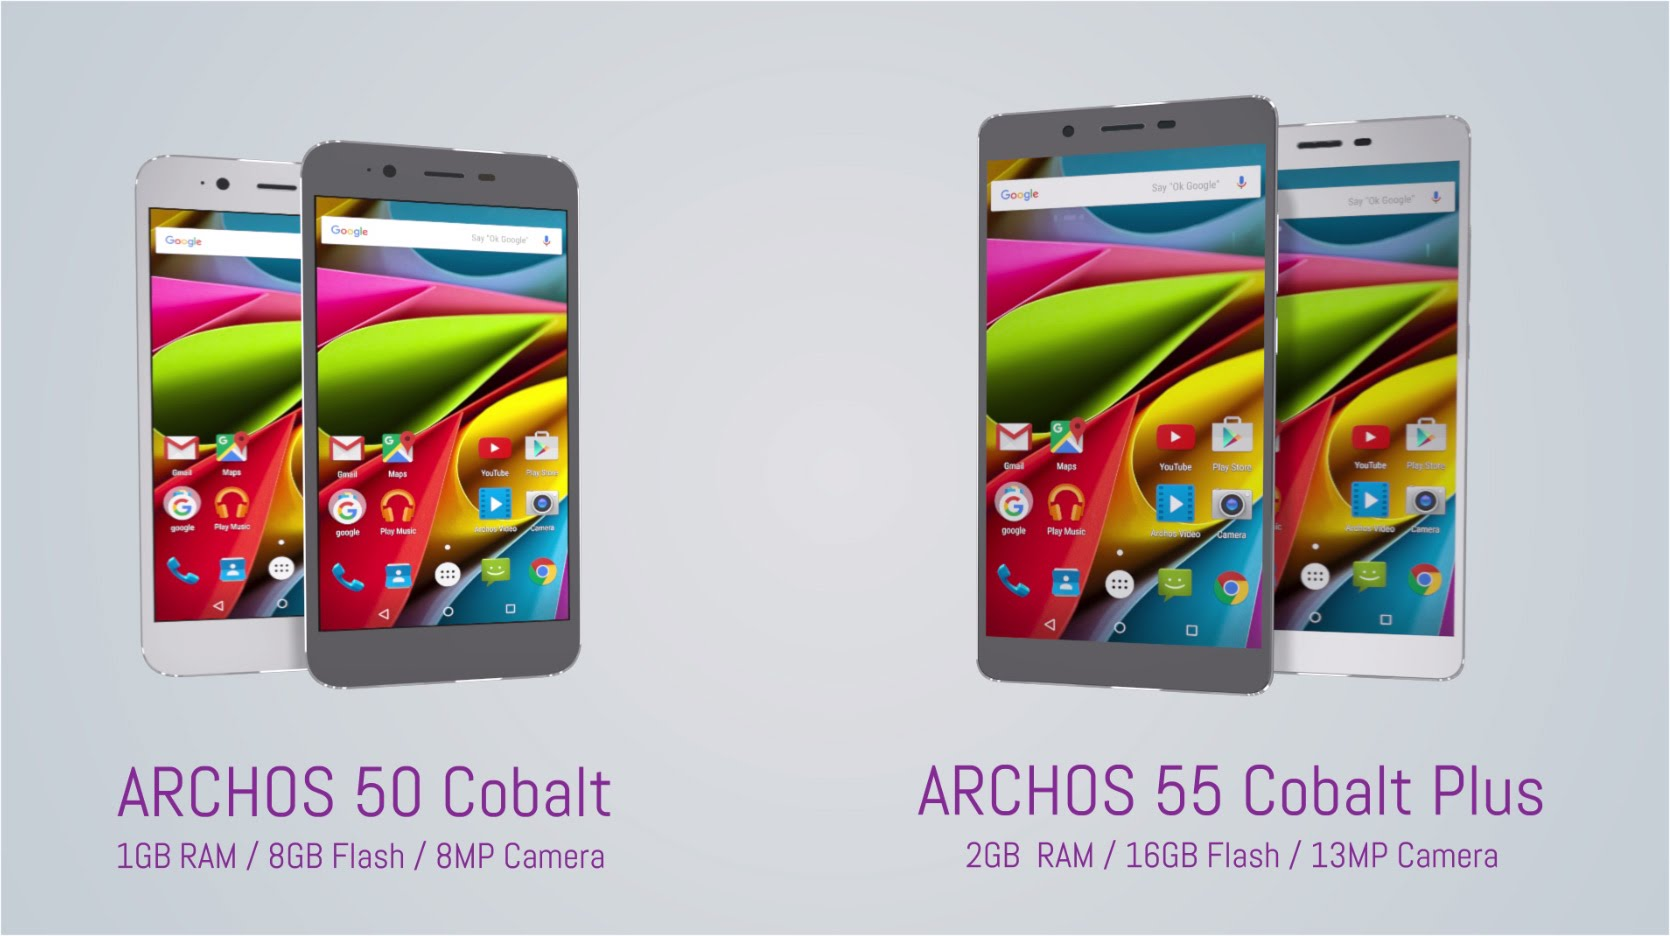 Archos 50 Cobalt